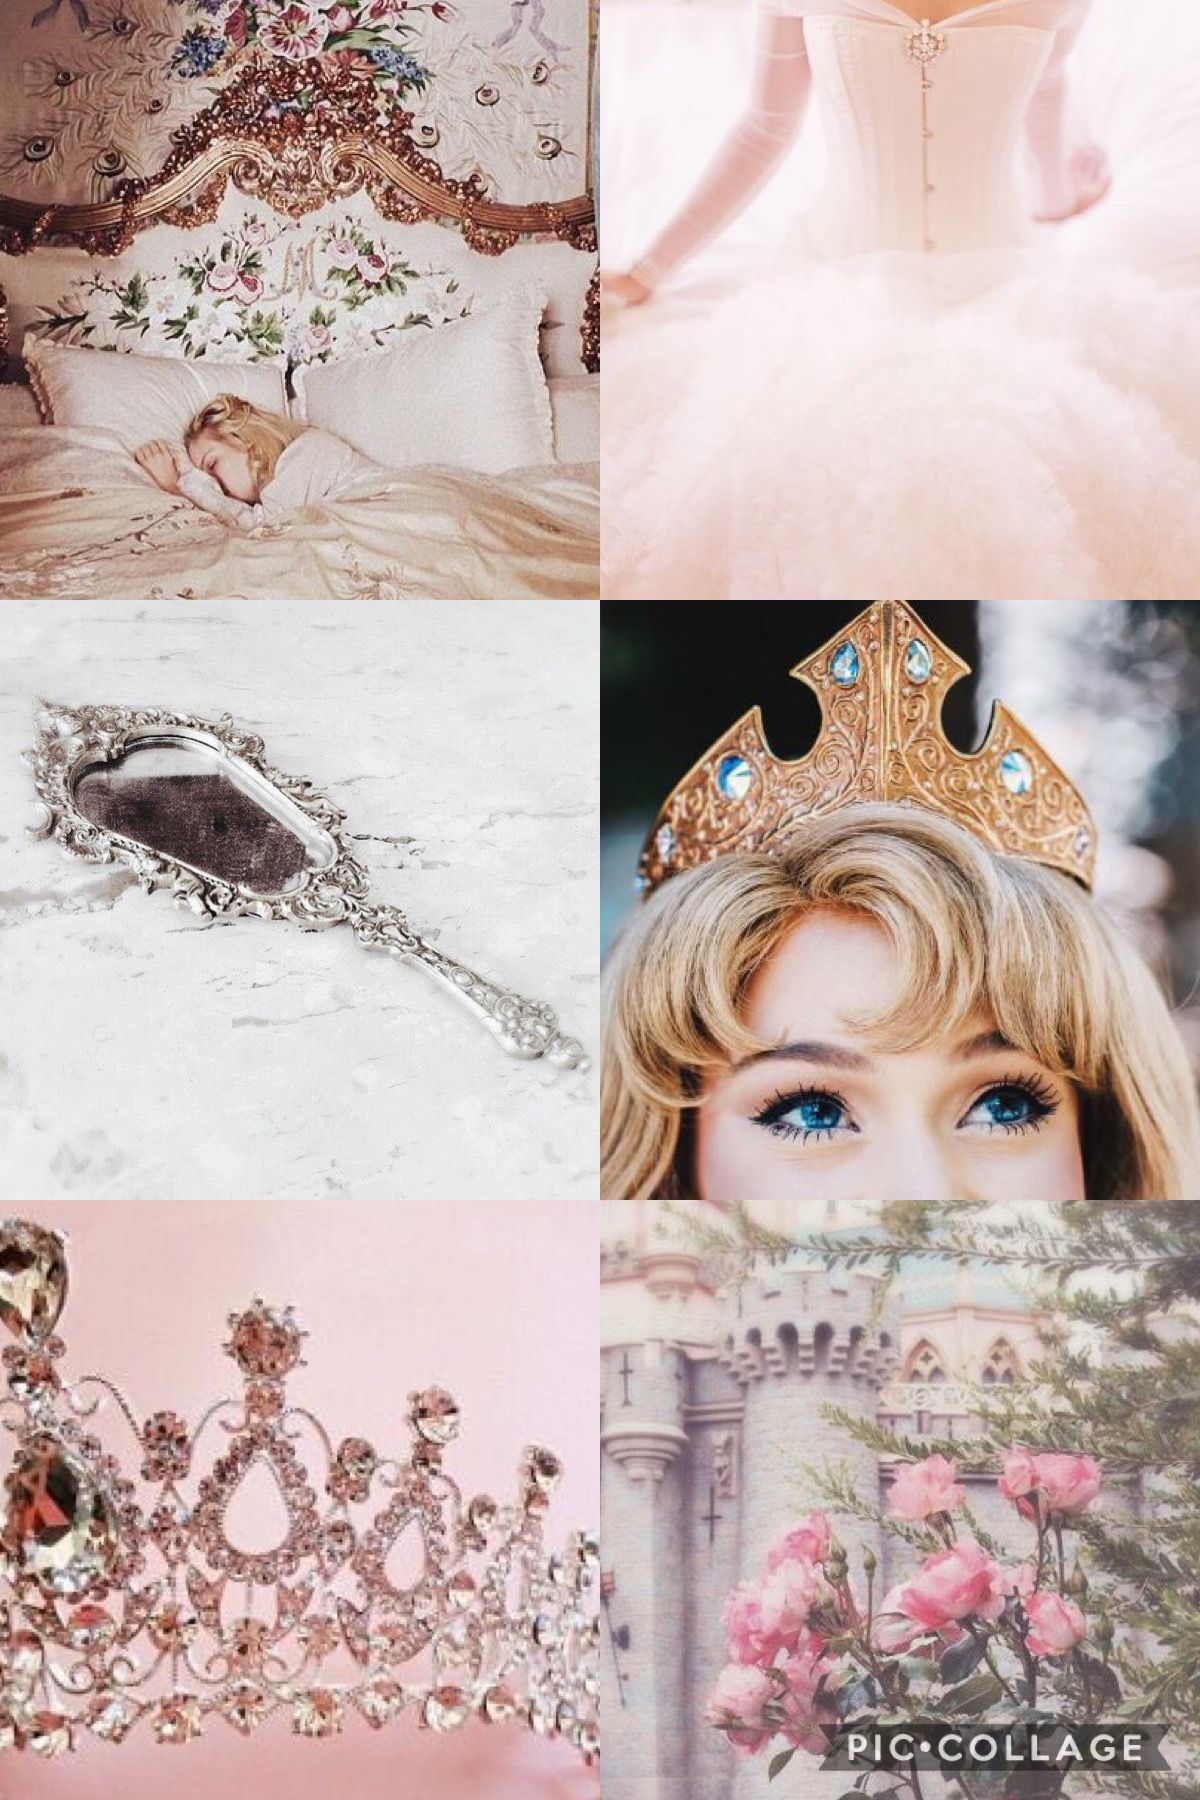 Aesthetic Sleeping Beauty Disney Princess Wallpaper Disney Sleeping Beauty Aurora Sleeping Beauty